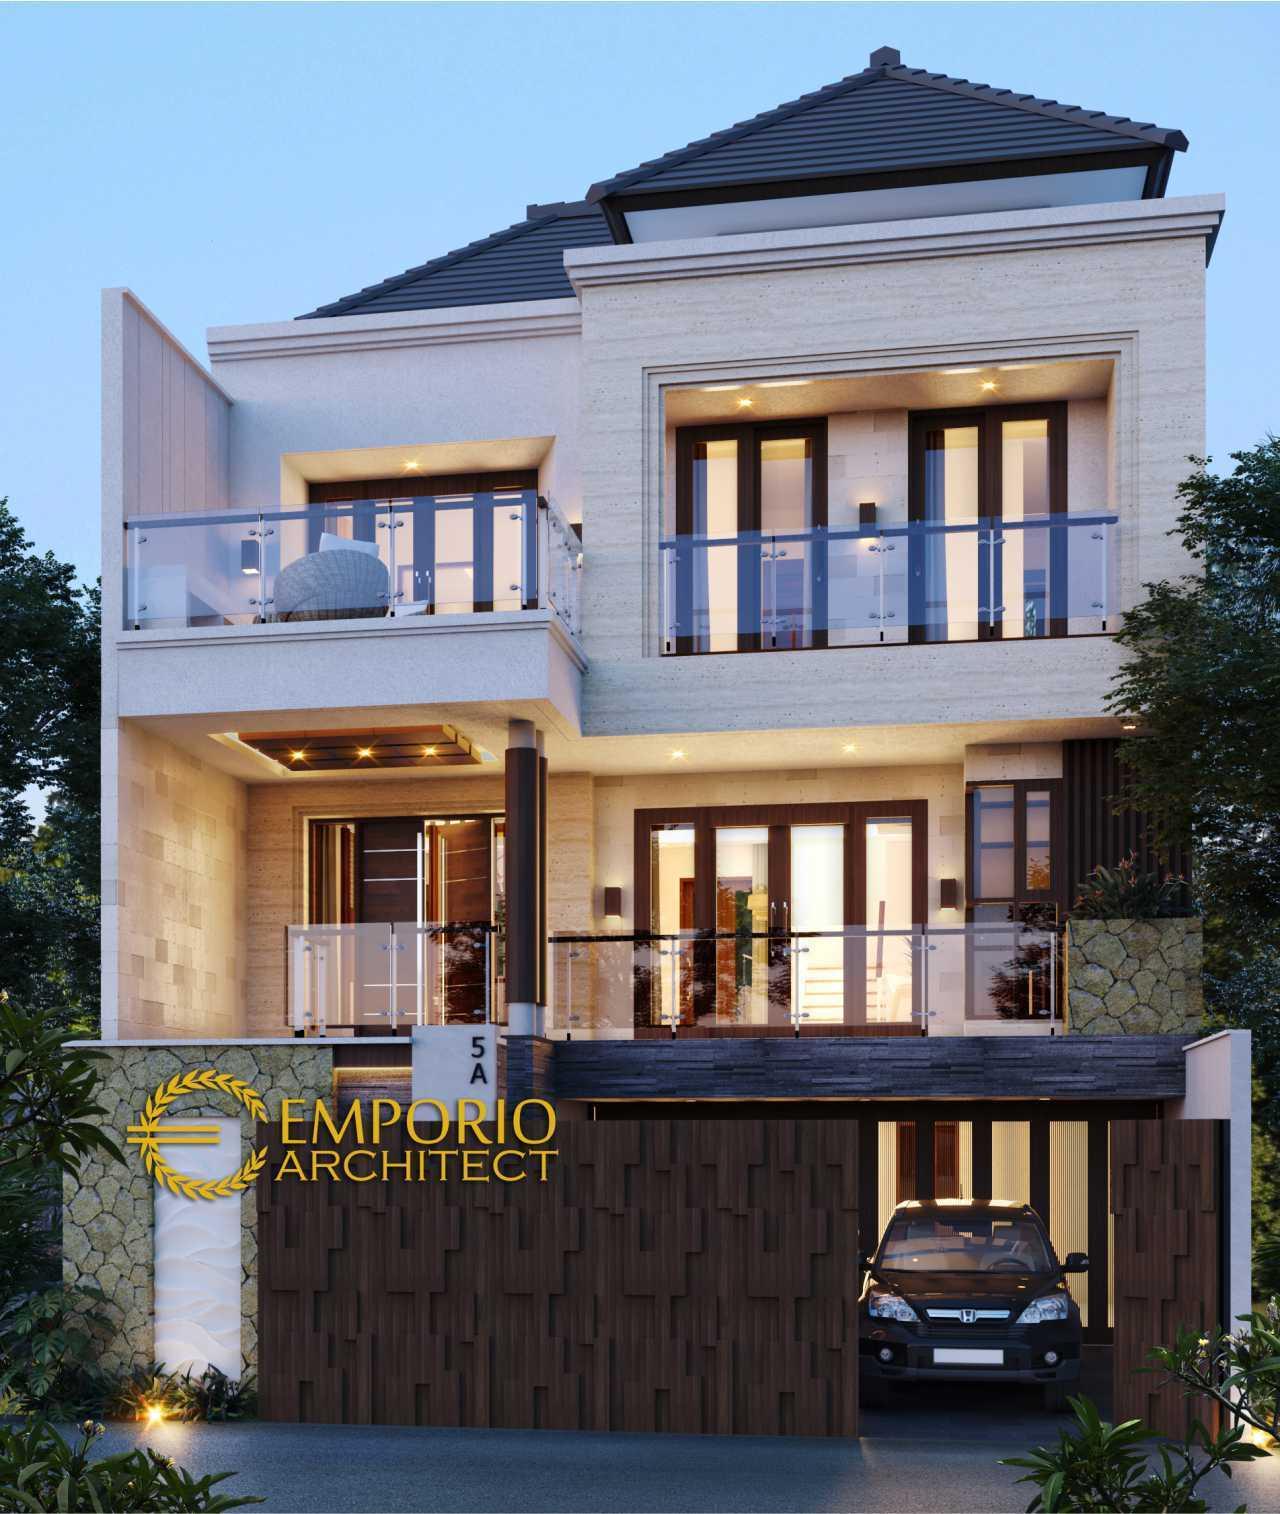 Emporio Architect Jasa Arsitek Denpasar Desain Rumah Modern 3 Lantai 734 @ Denpasar, Bali Kota Denpasar, Bali, Indonesia Kota Denpasar, Bali, Indonesia Emporio-Architect-Jasa-Arsitek-Denpasar-Desain-Rumah-Modern-3-Lantai-734-Denpasar-Bali Modern 93963